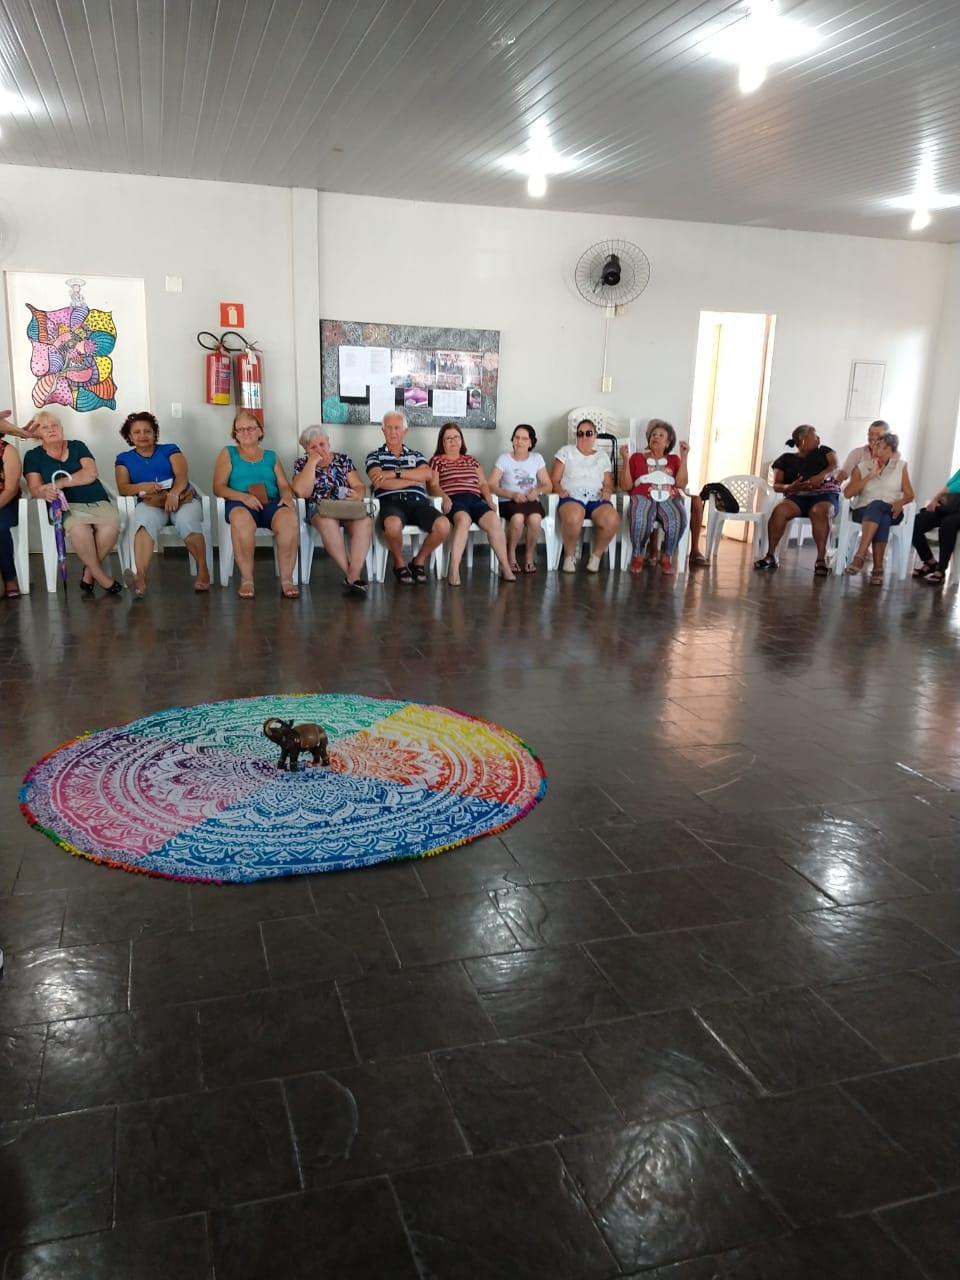 Circulo de dança